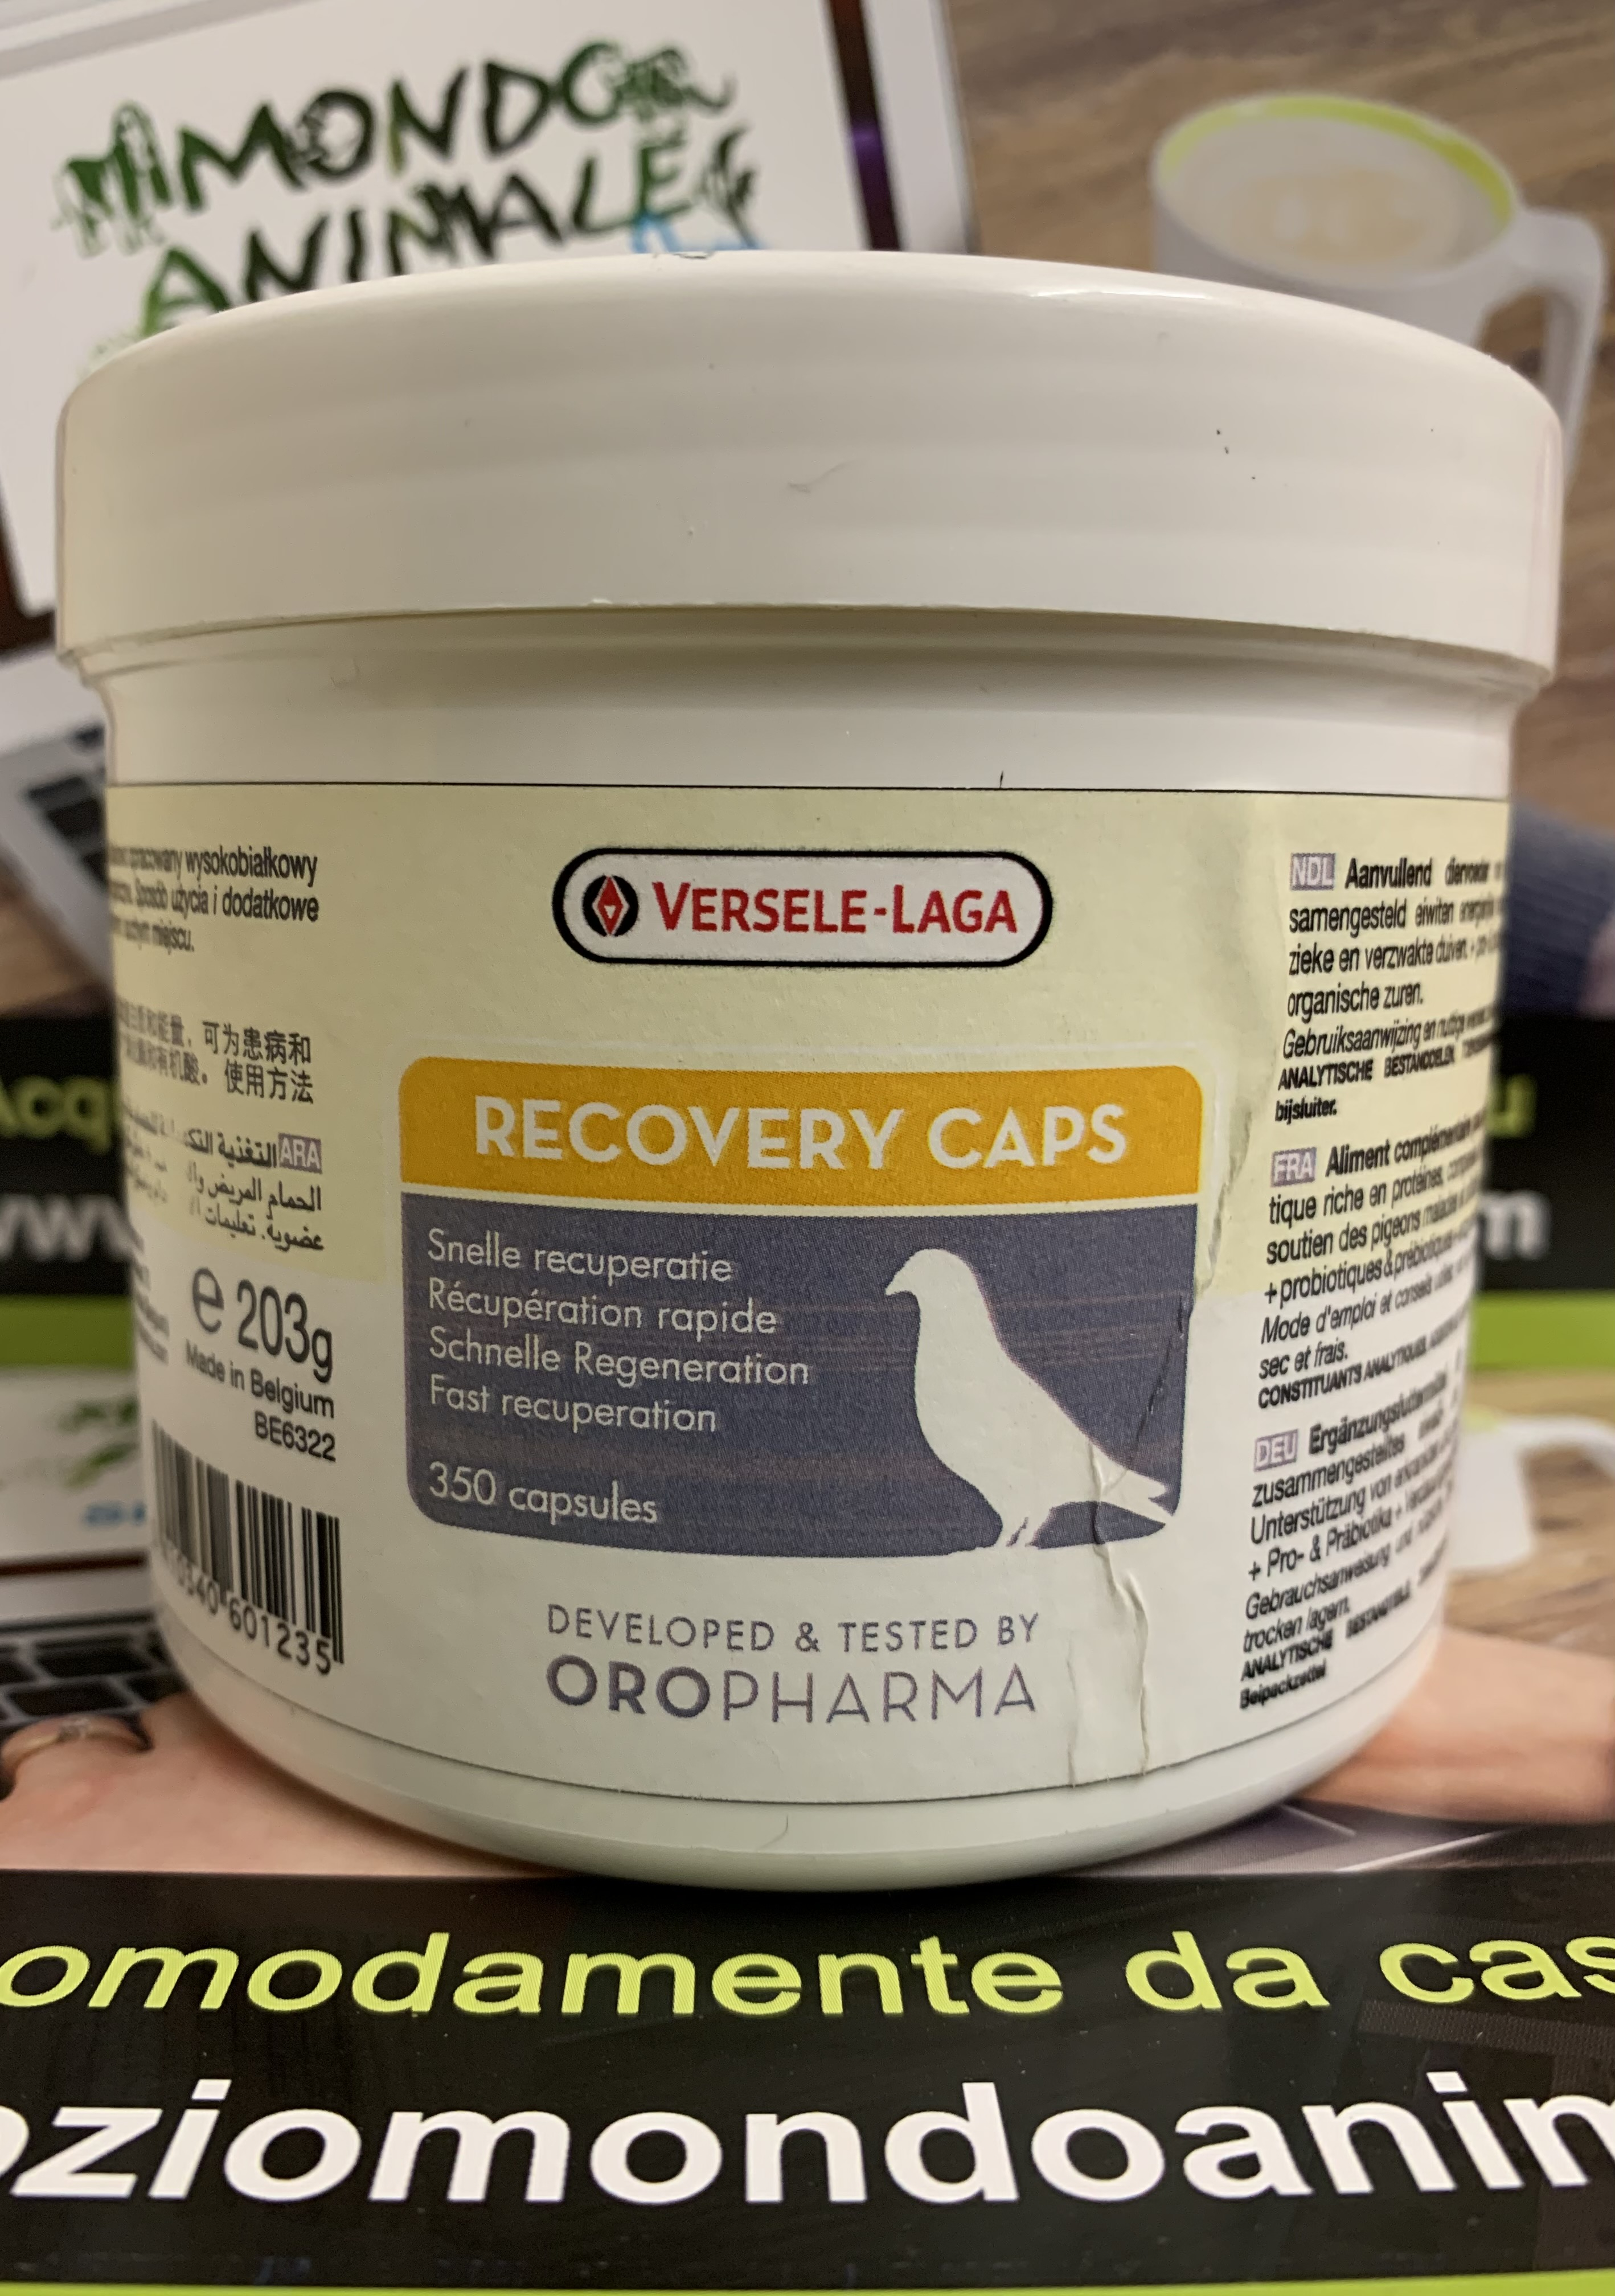 RECOVERY CAPS 350 capsules